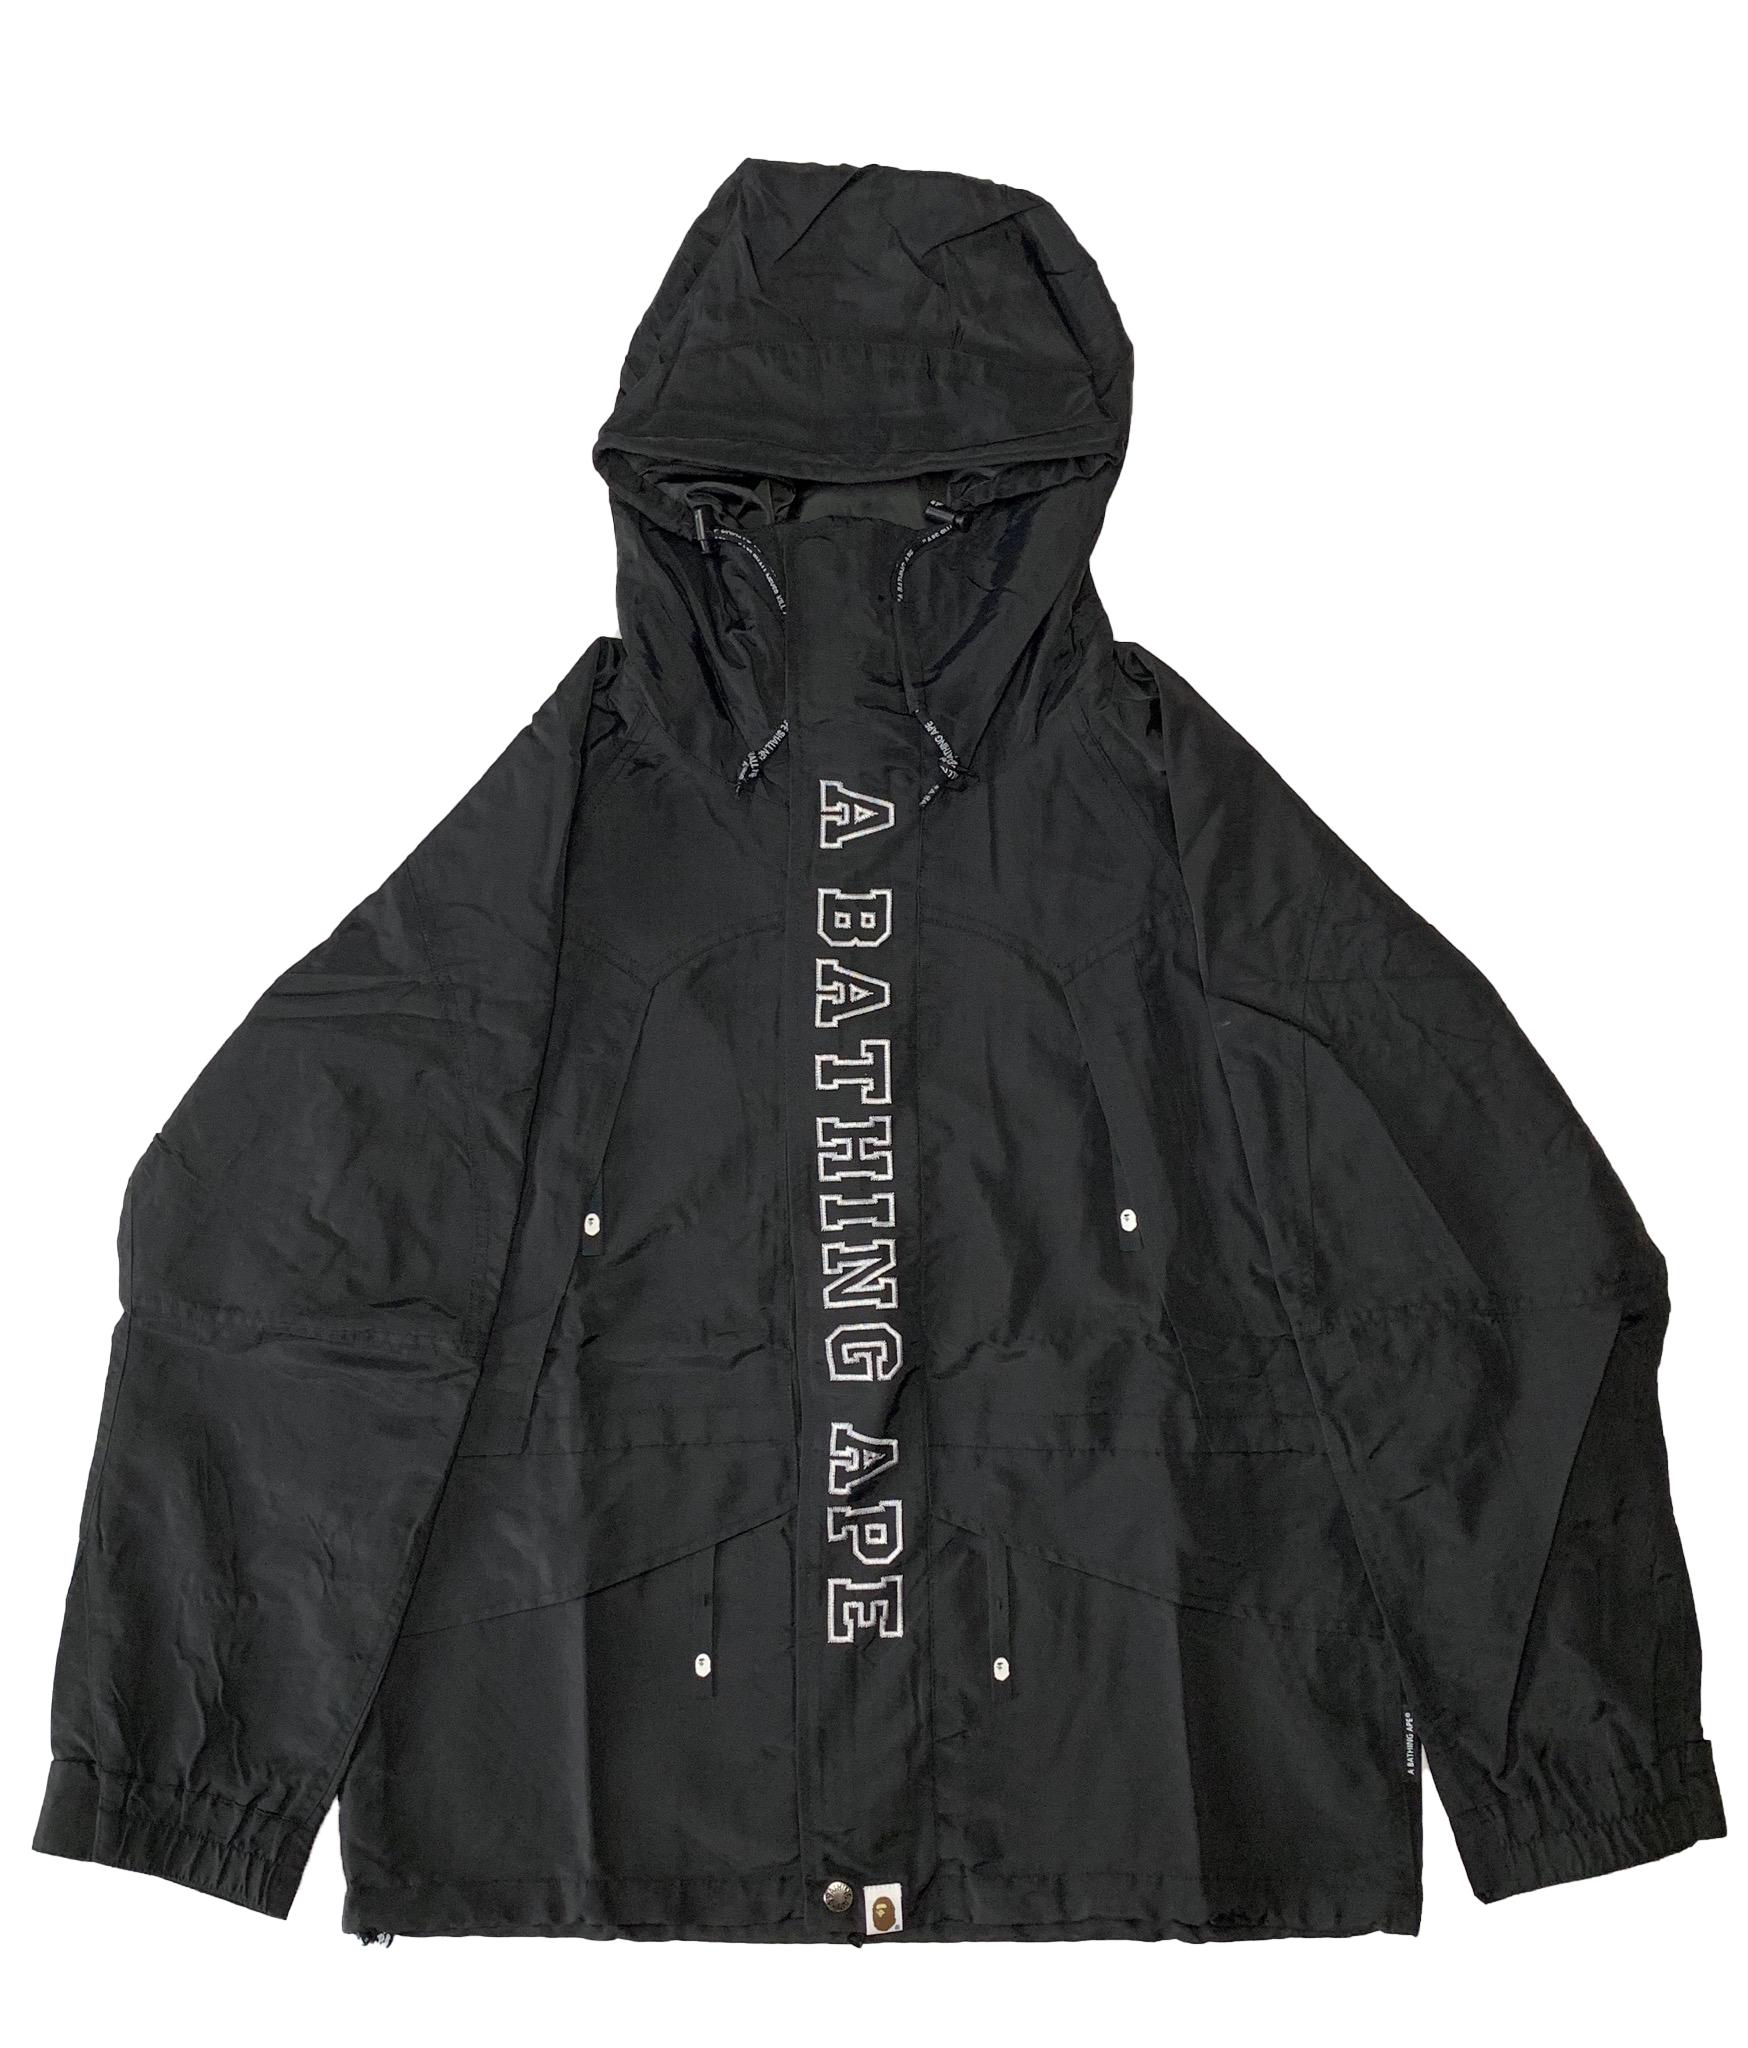 Sell Buyamp; Jackets Bape Sell Bape Streetwear Jackets Buyamp; stQhrd